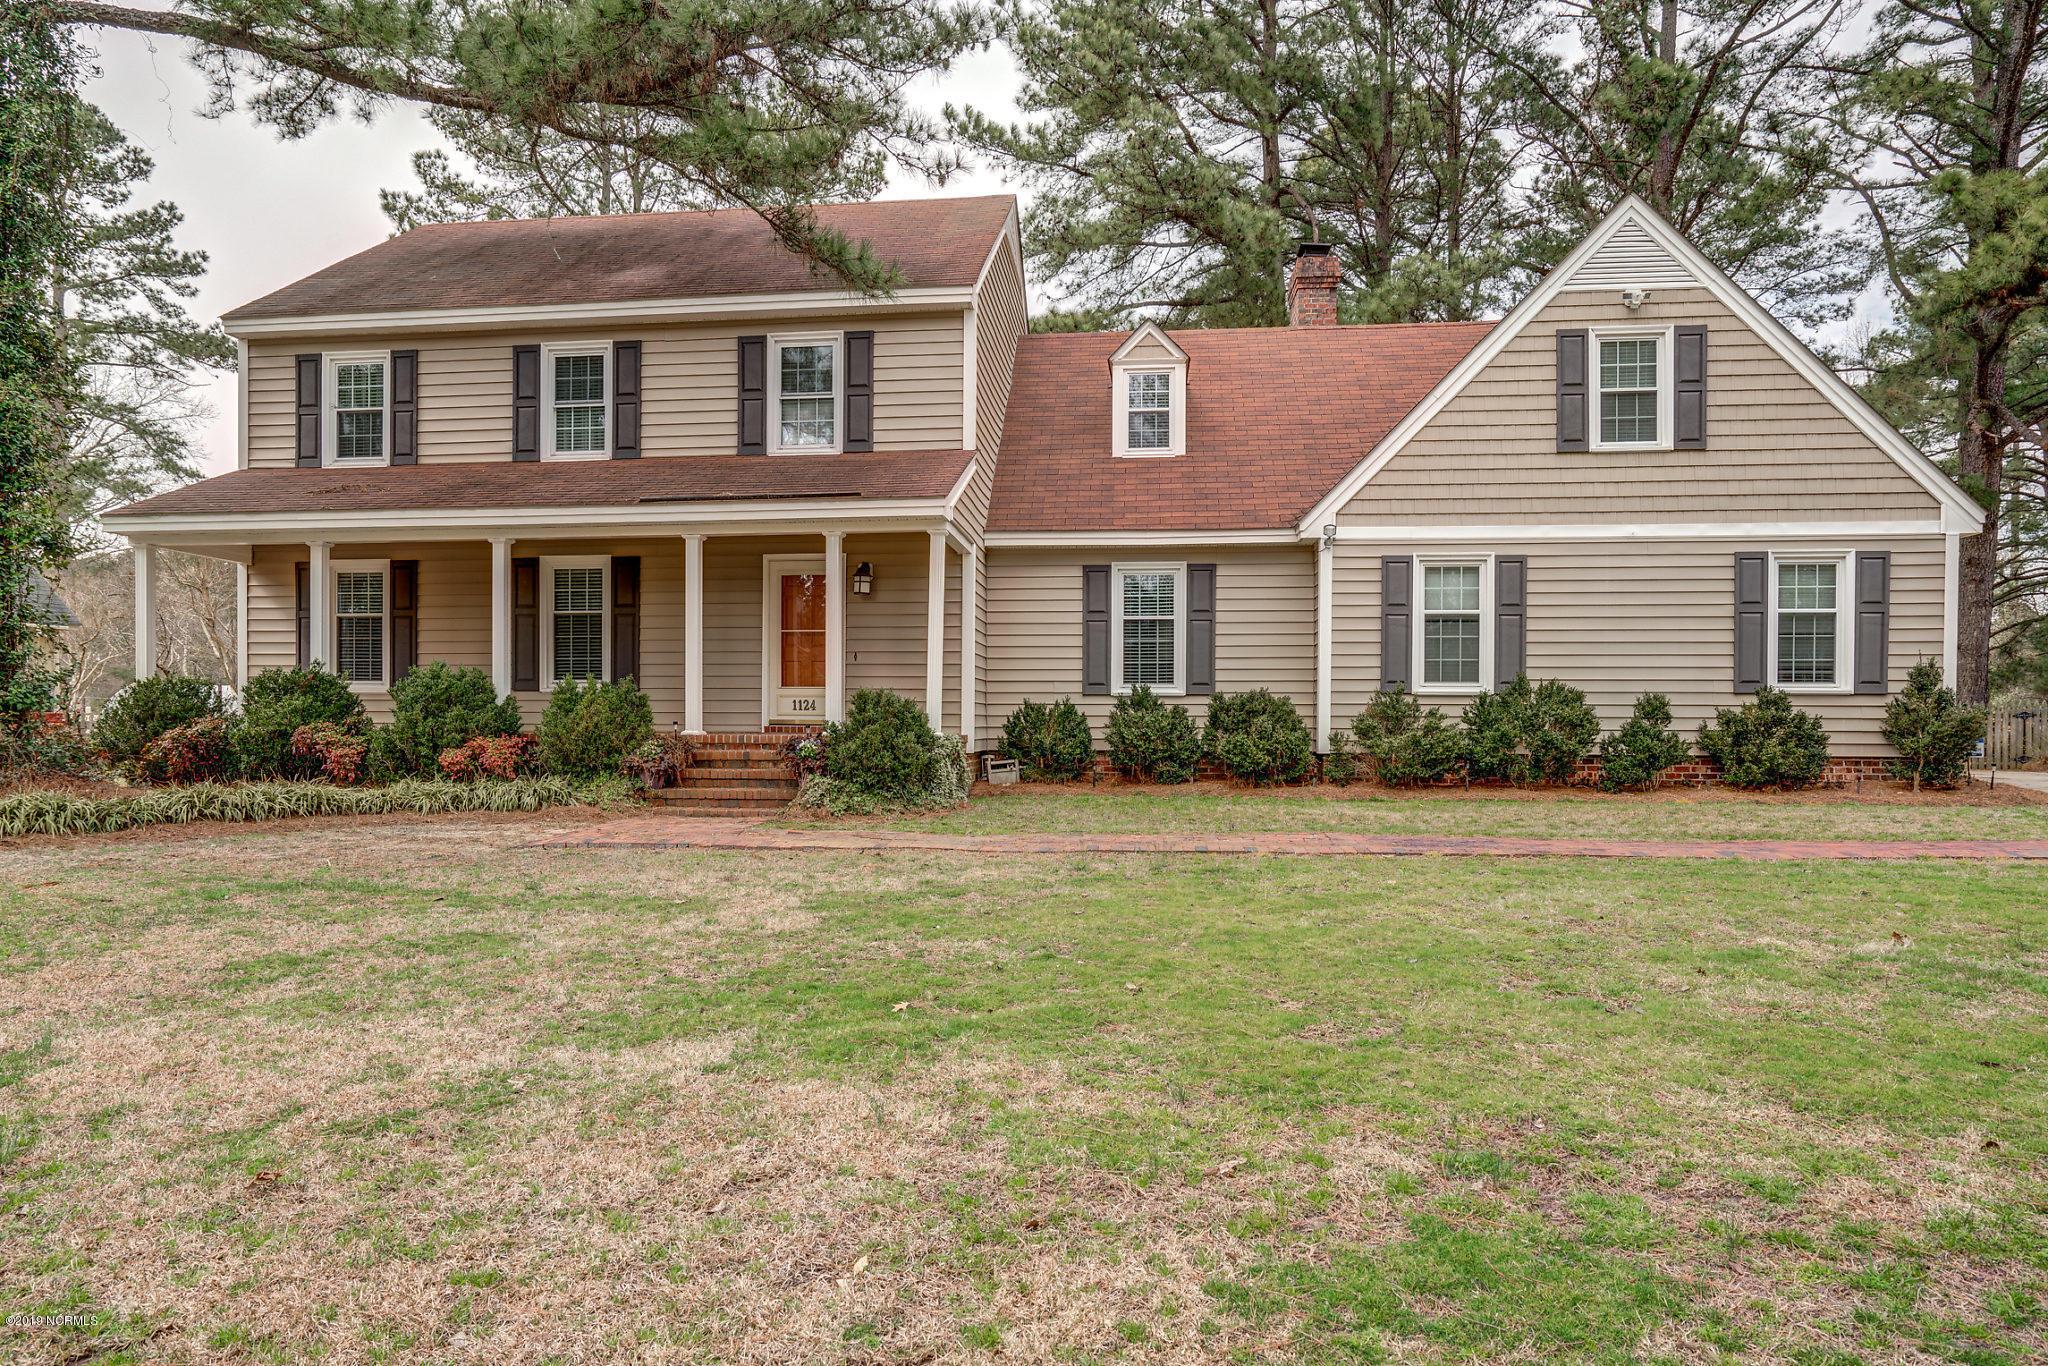 1124 Mashie Lane, Rocky Mount, North Carolina, 4 Bedrooms Bedrooms, 8 Rooms Rooms,2 BathroomsBathrooms,For sale,Mashie,100154517